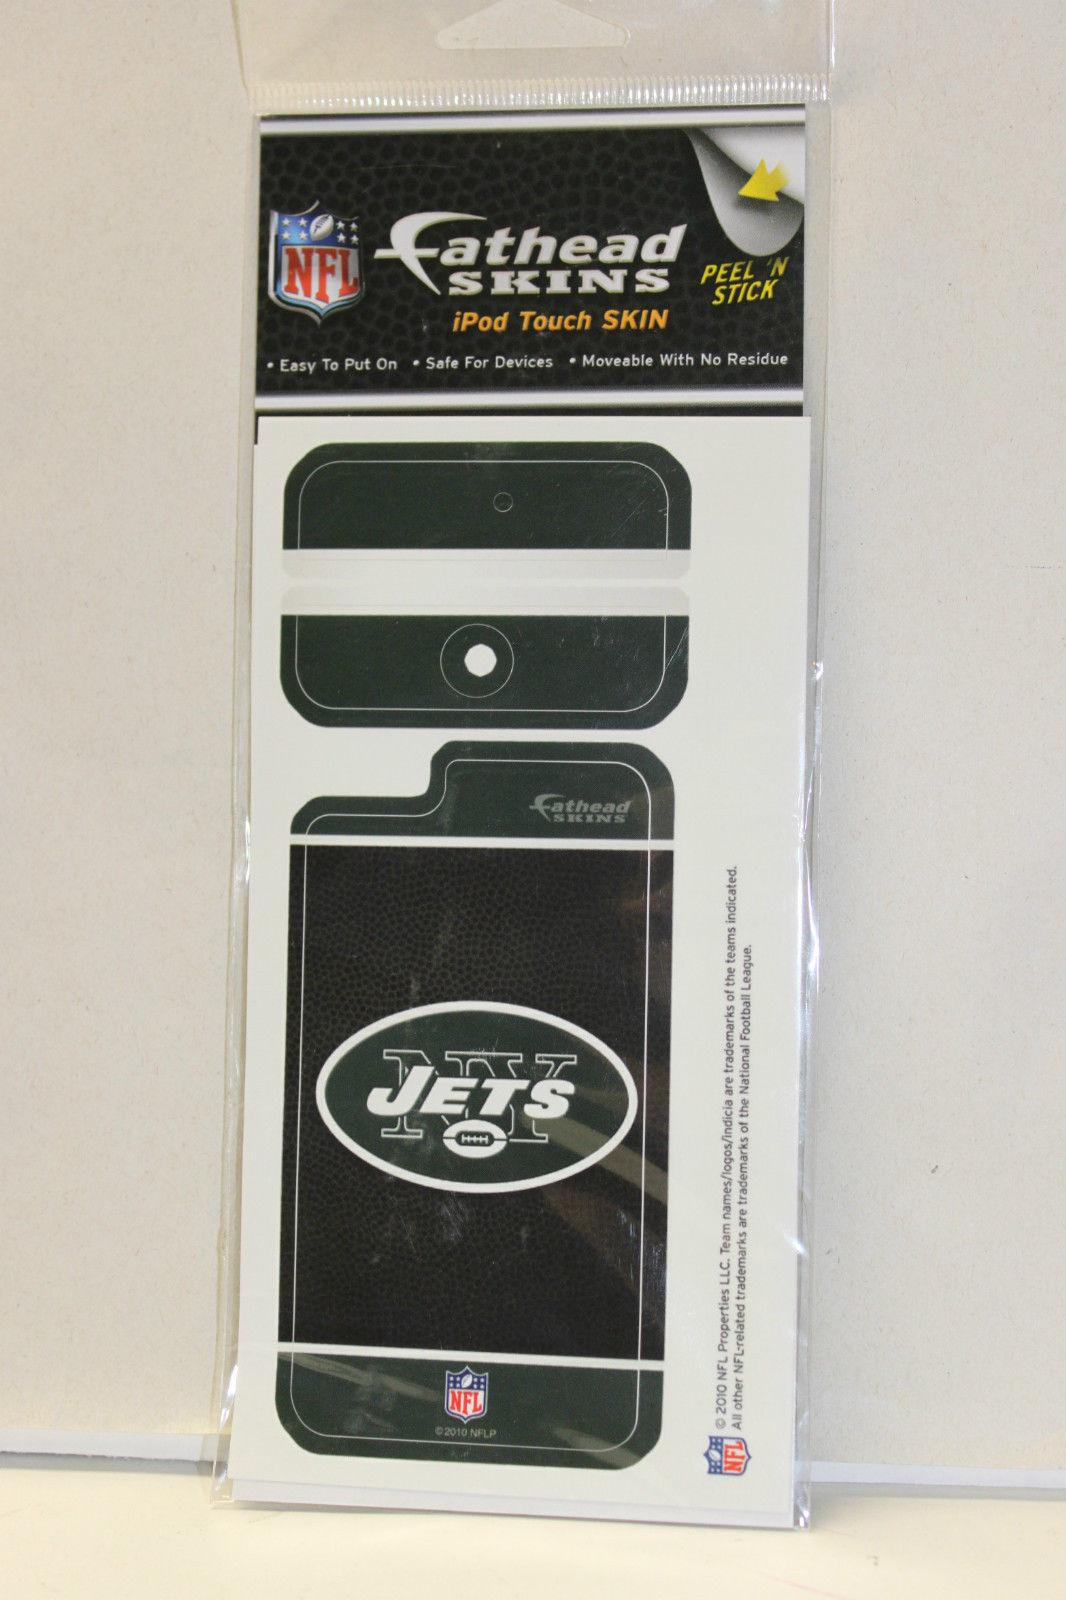 FATHEAD SKIN iPod Touch Skin Peel n Stick NEW YORK JETS 1028-00022